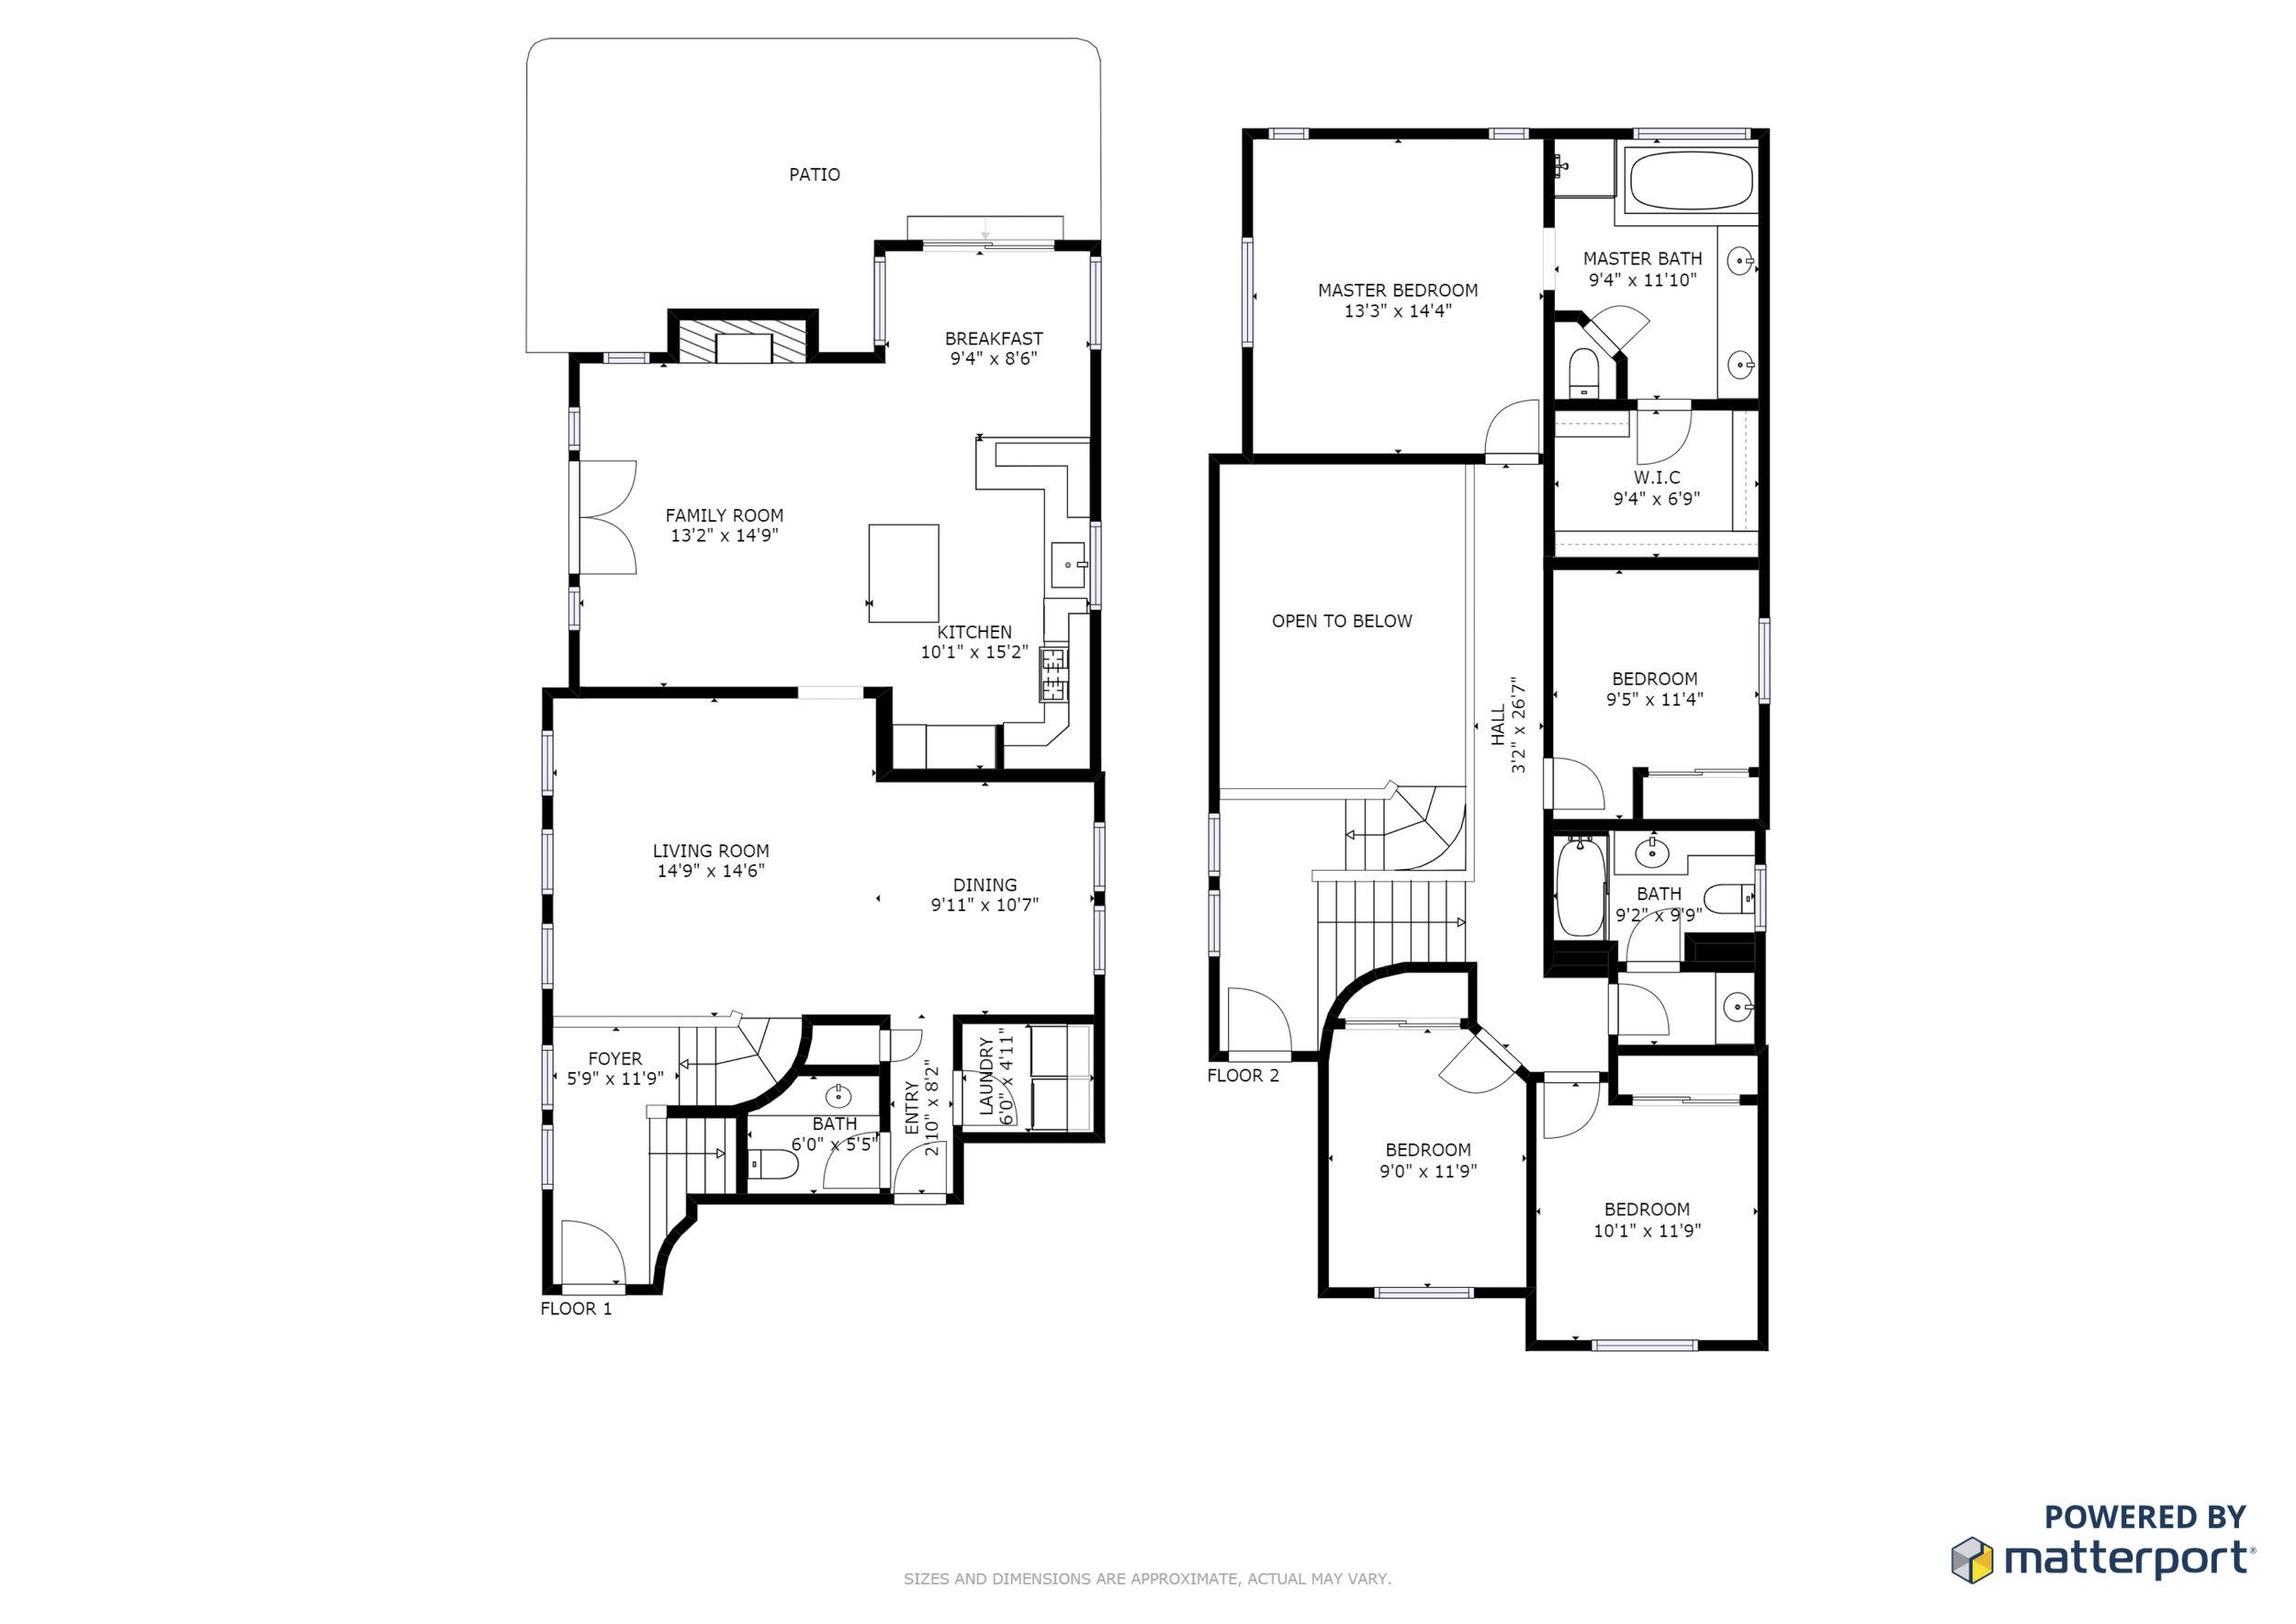 190 Centre St - Floor Plan.jpg